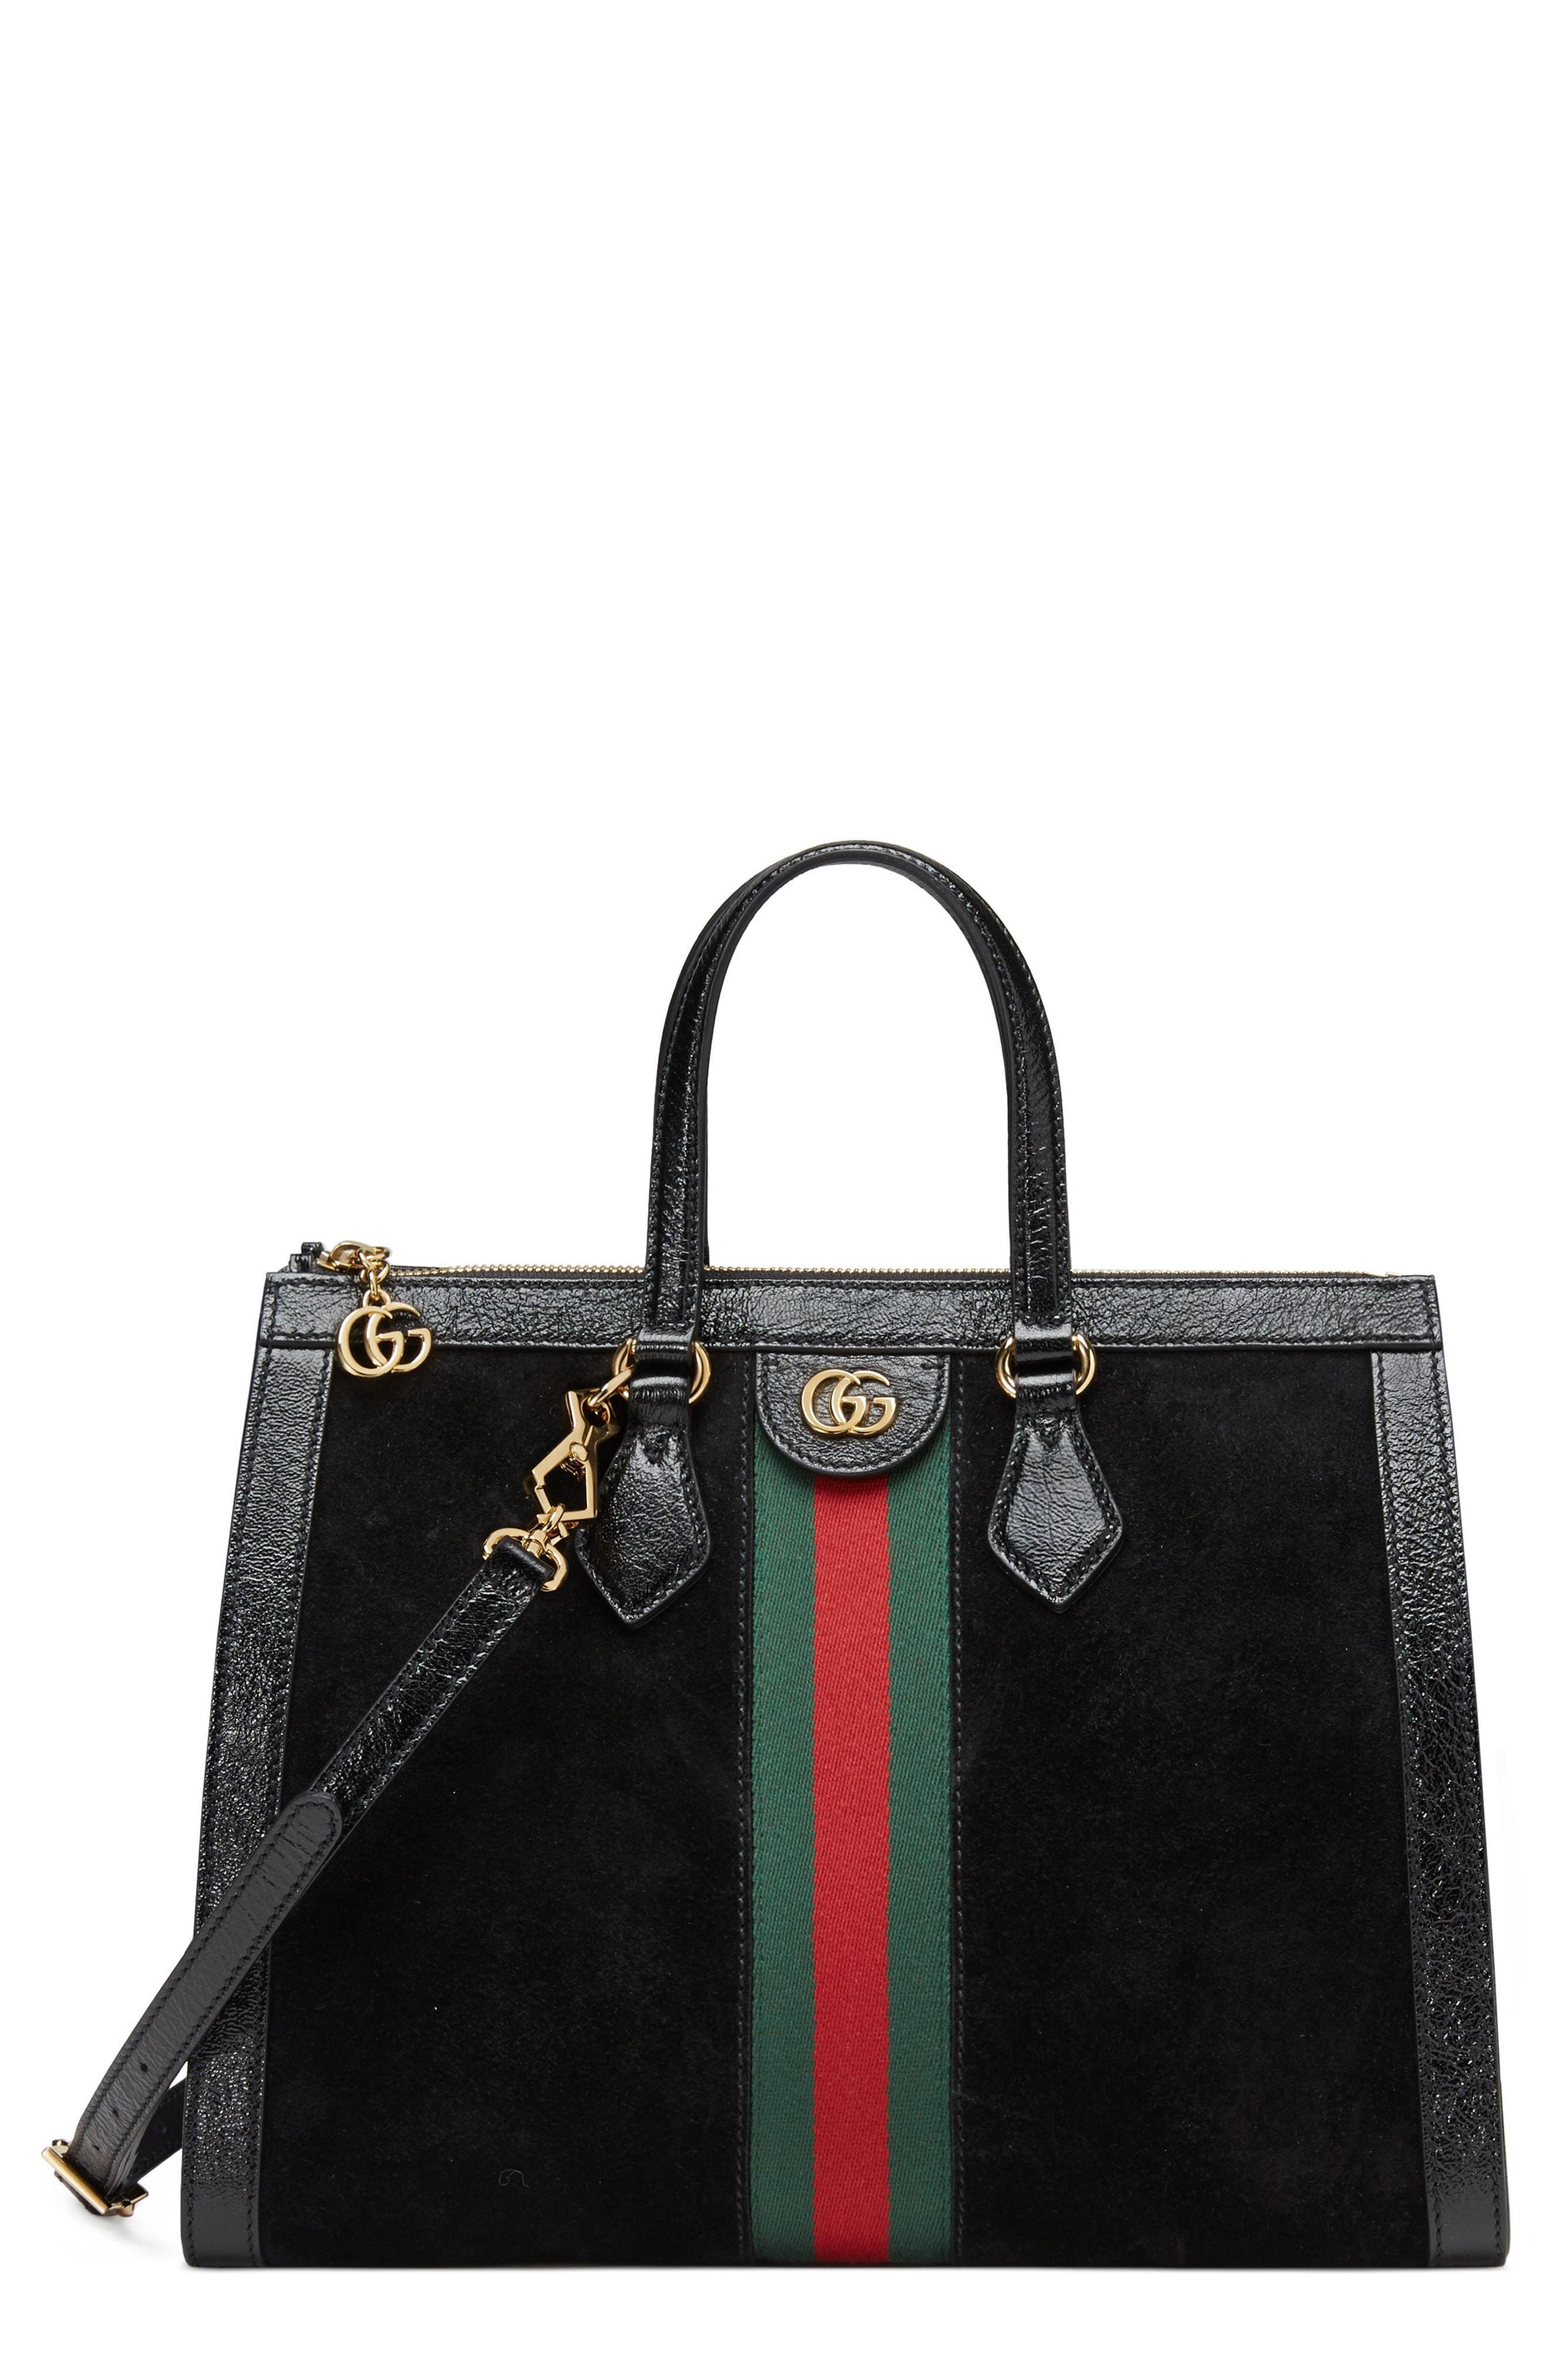 e7cde8667770 Gucci Women's Medium Ophidia Tote - Black in Black - Save 4% - Lyst